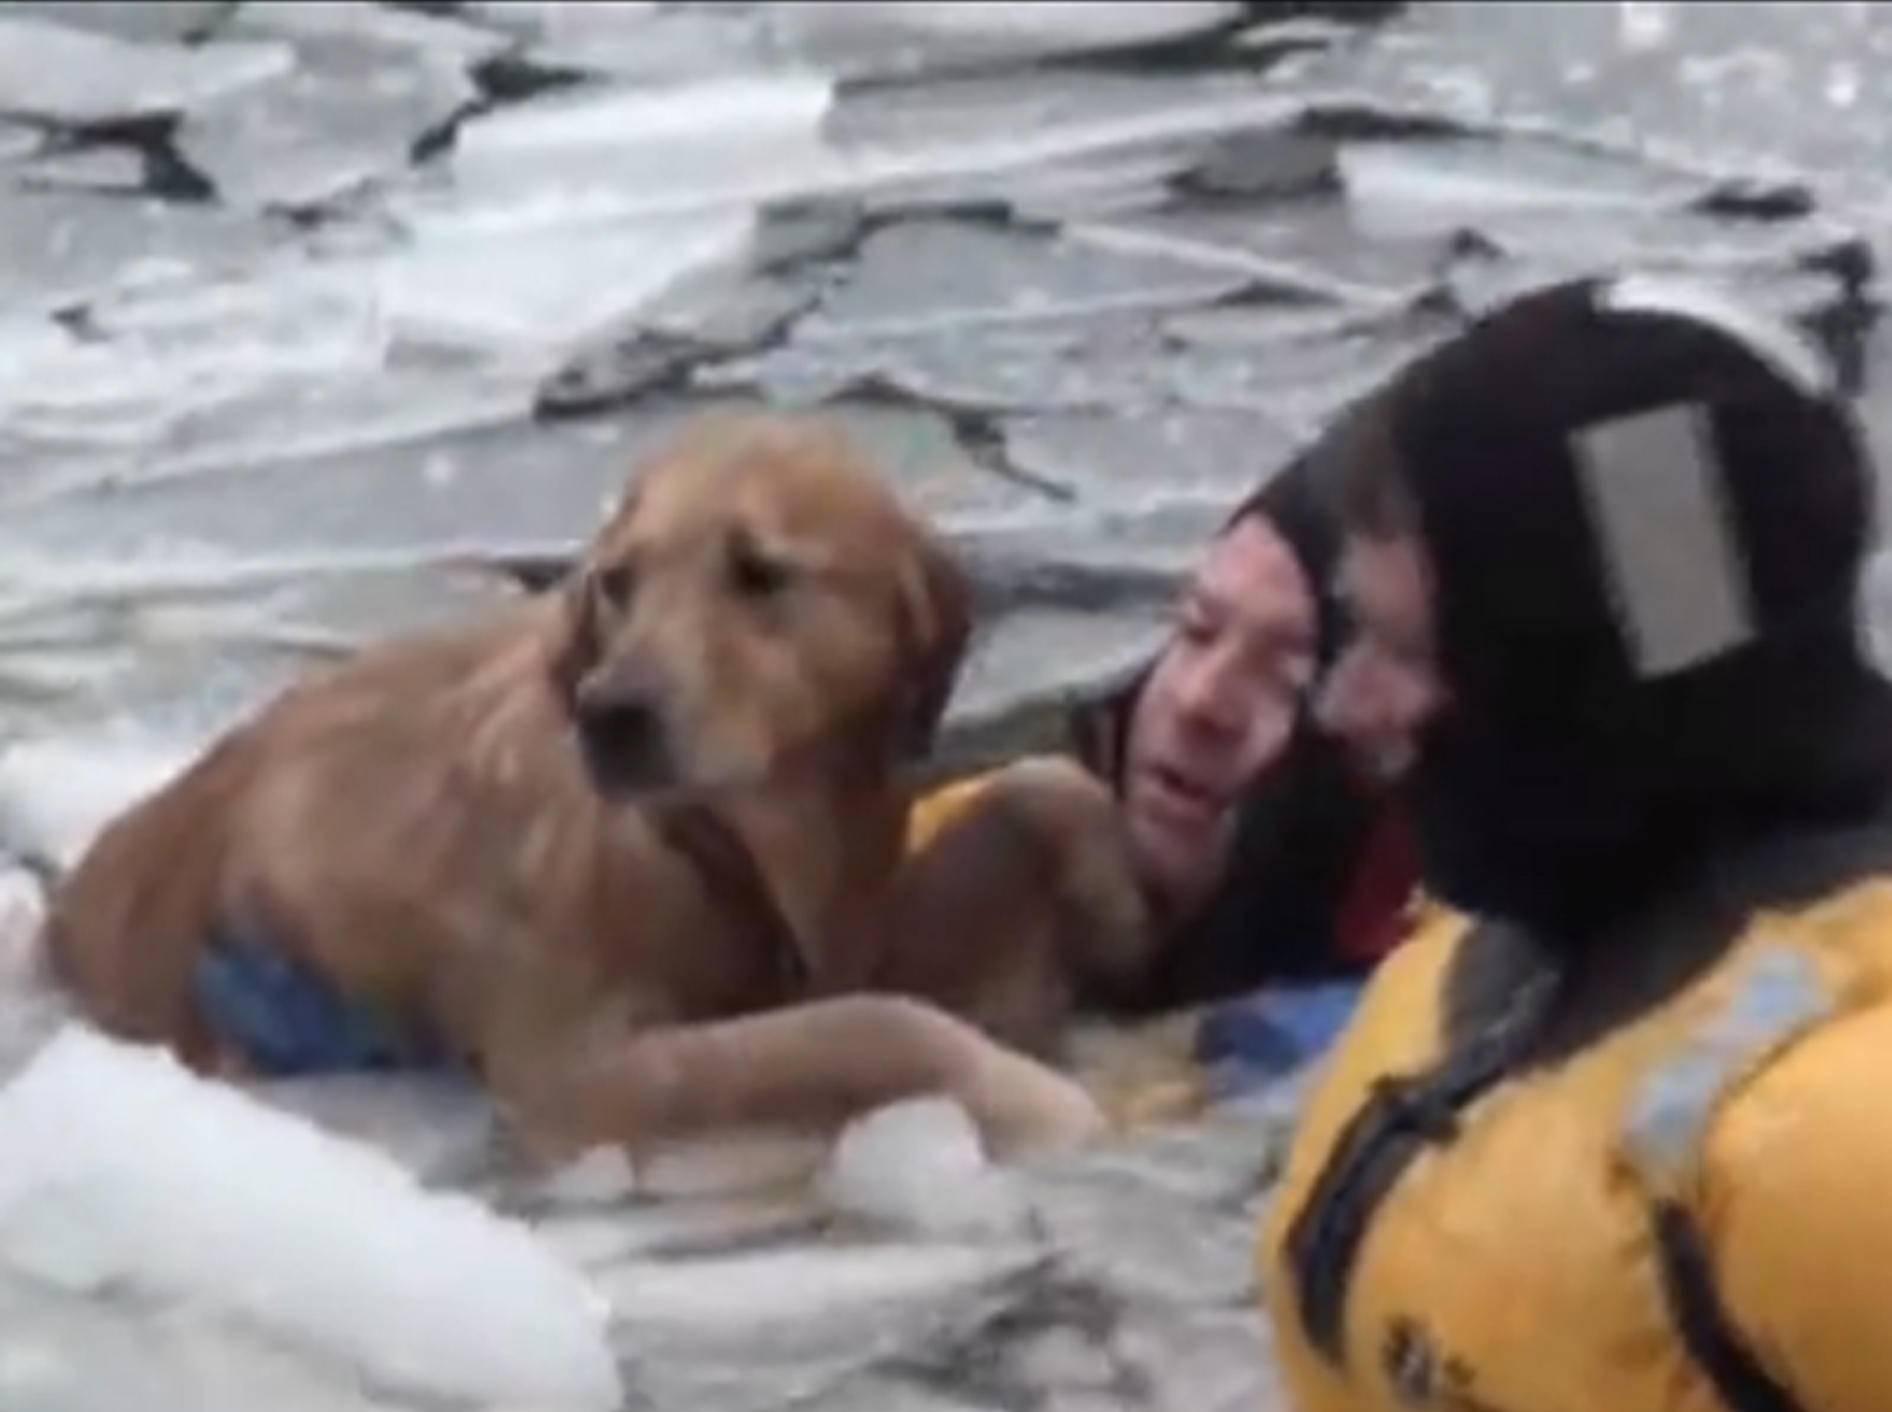 Feuerwehr rettet Golden Retriever aus eisigem Wasser – Bild: Youtube / AssociatedPress